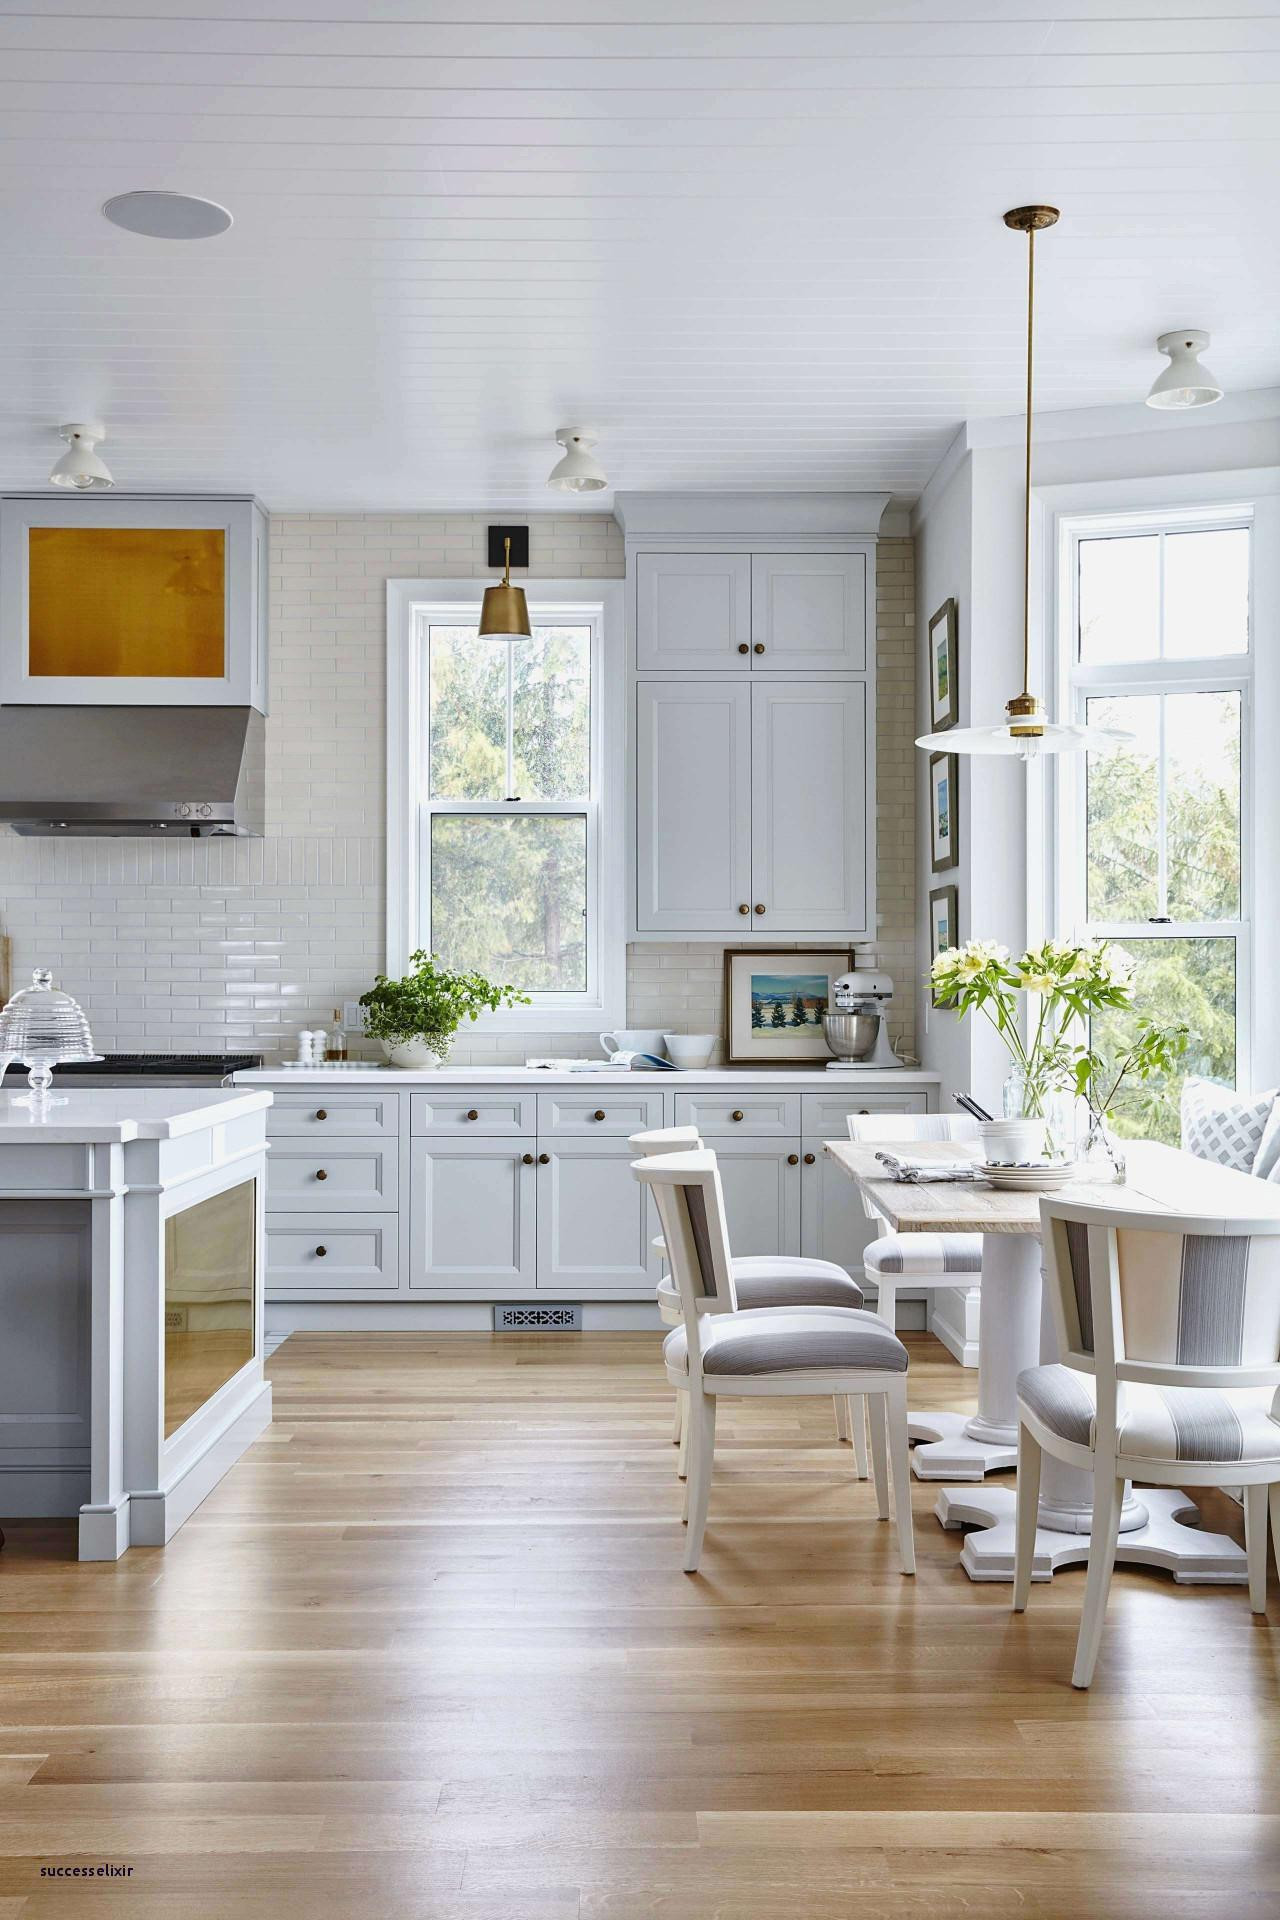 Dg Hardwood Floors Of Beautiful Of Diy Storage Ideas Pics Artsvisuelscaribeens Com with Regard to Diy Bedroom Storage Ideas Inspirational A Small Room Decoration Best Kitchen Joys Kitchen Joys Kitchen 0d